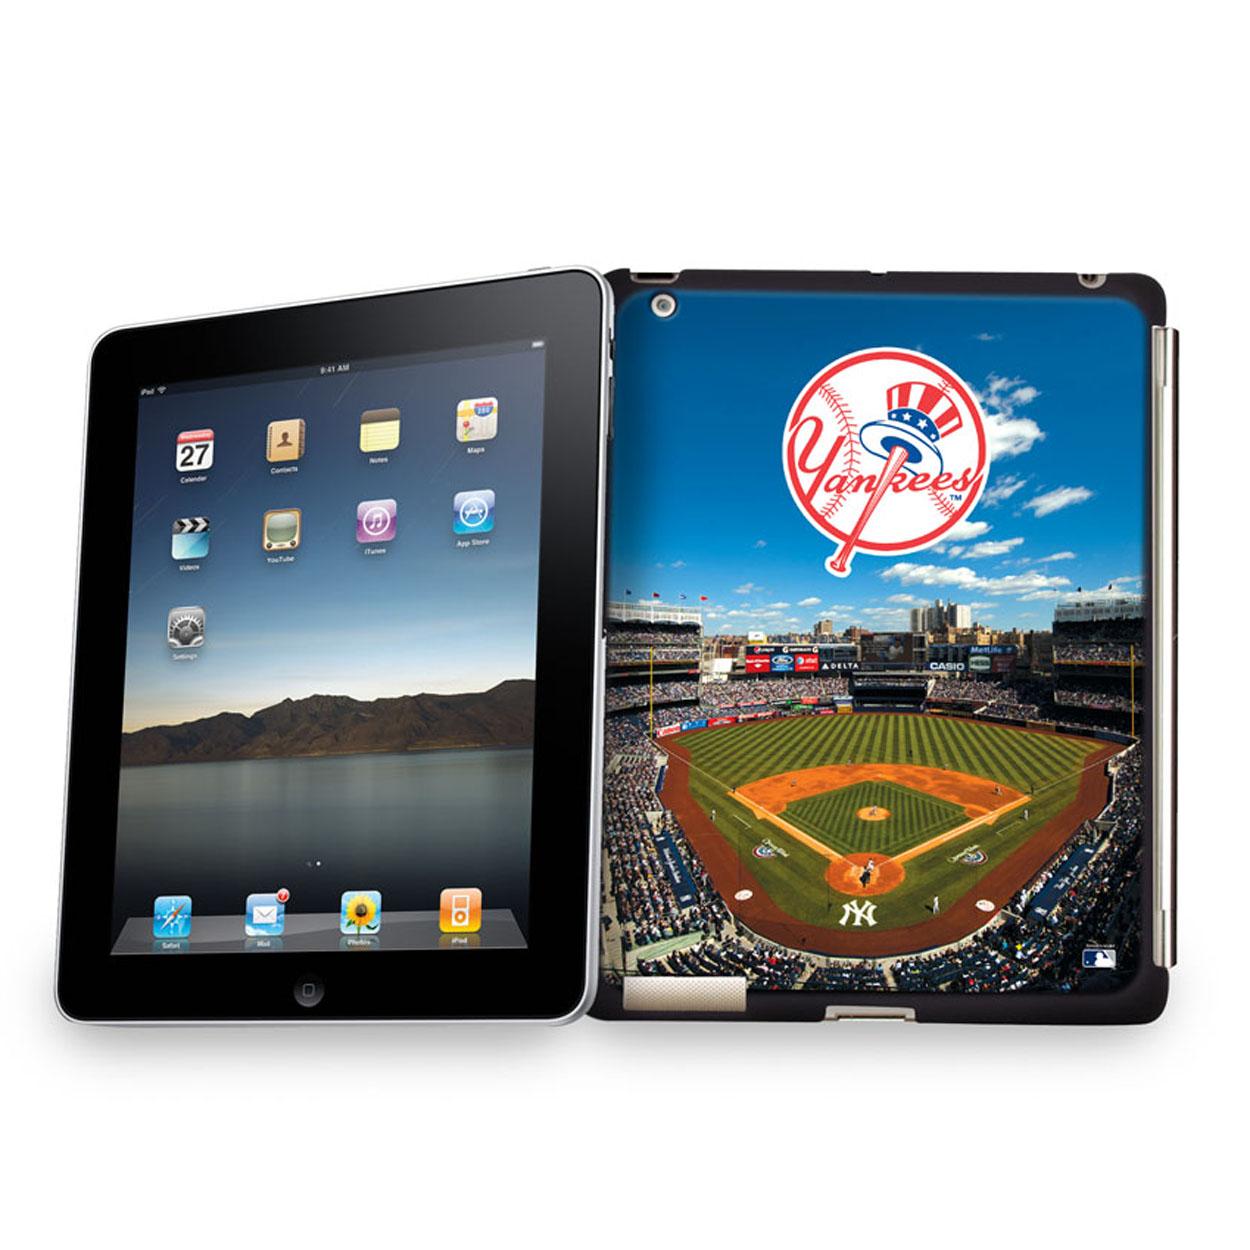 Pangea Ipad2 Stadium Collection Baseball Cover - New York...